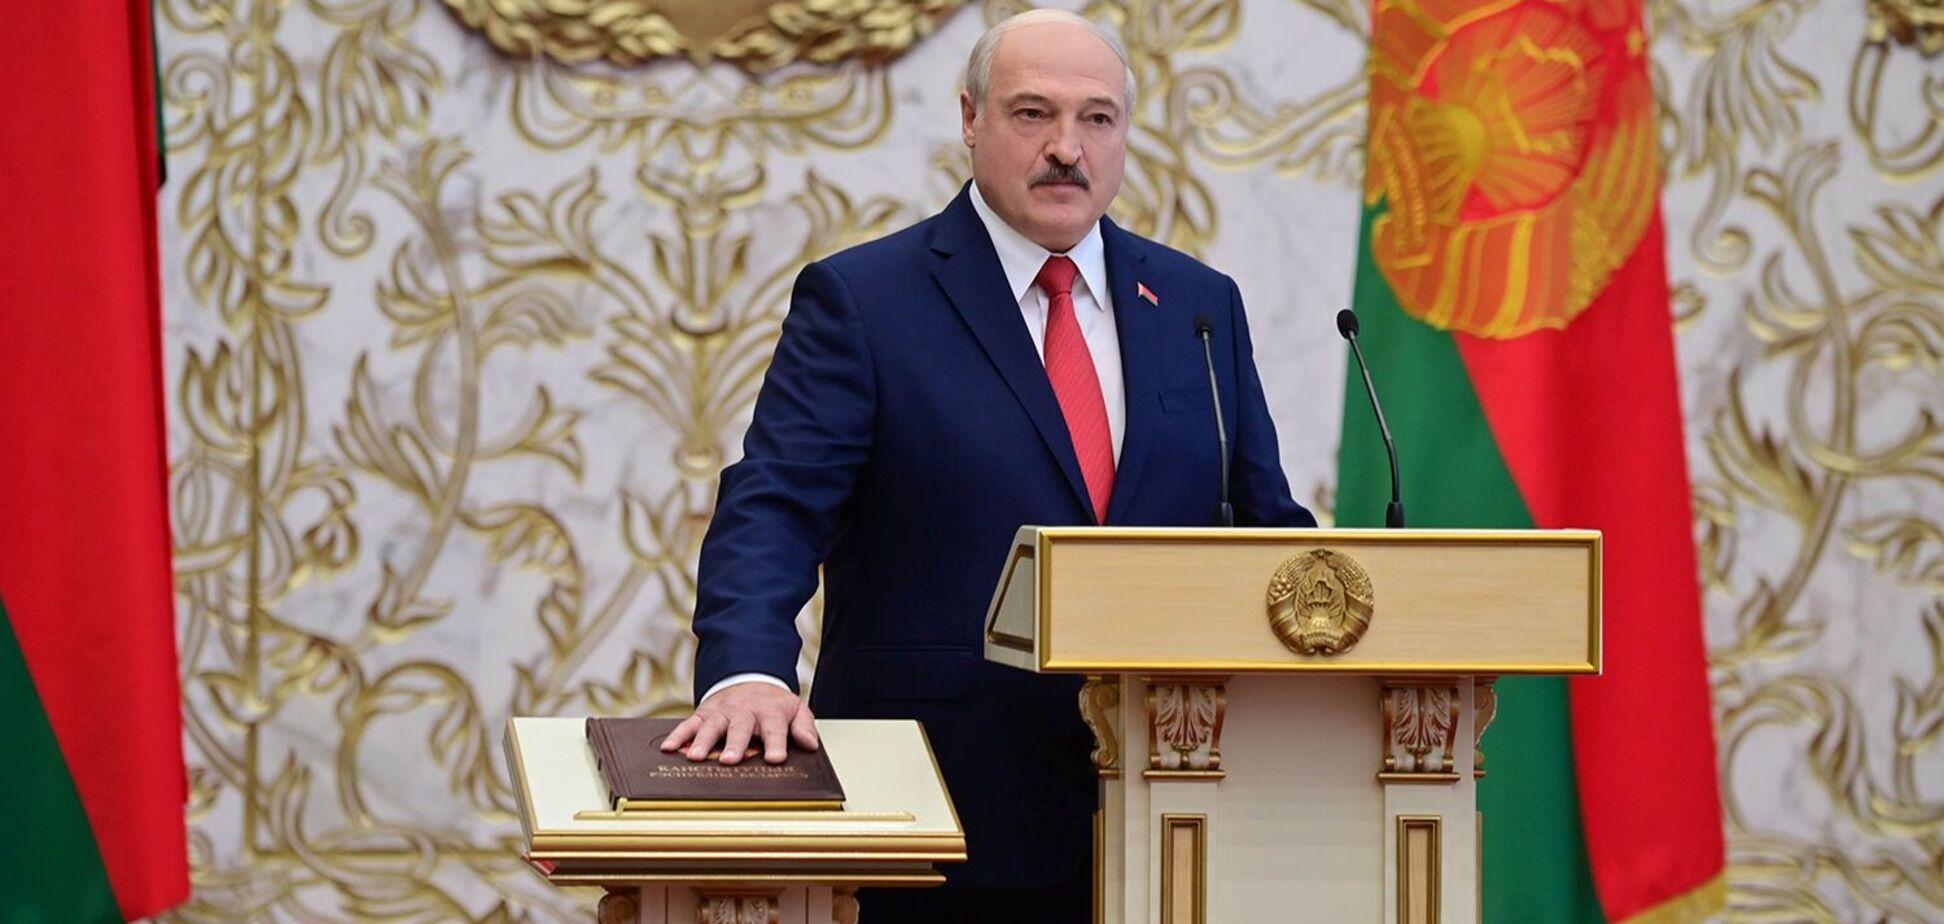 Александр Лукашенко провел незаконную инаугурацию